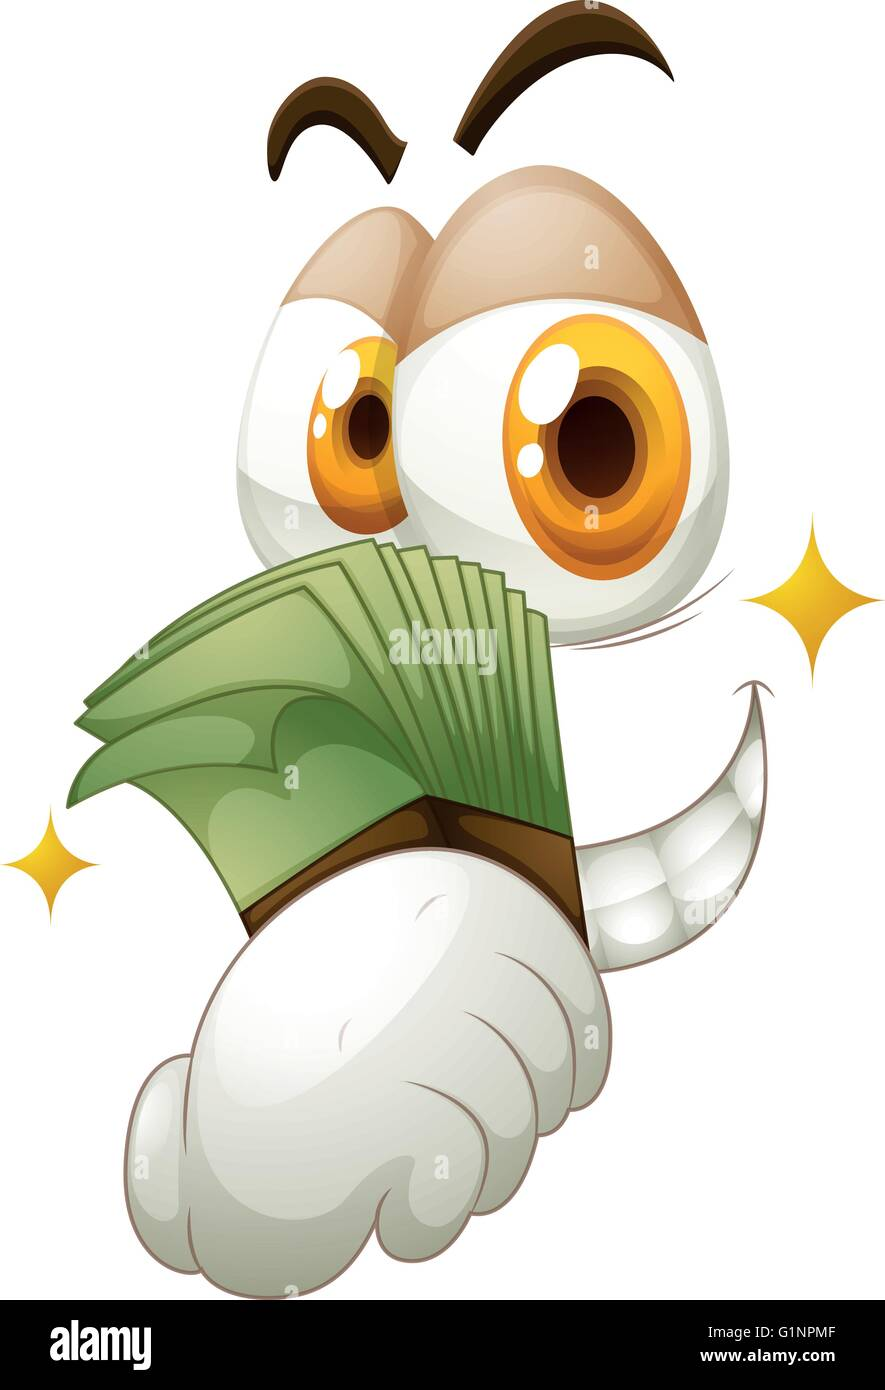 Money in hand on white illustration - Stock Image